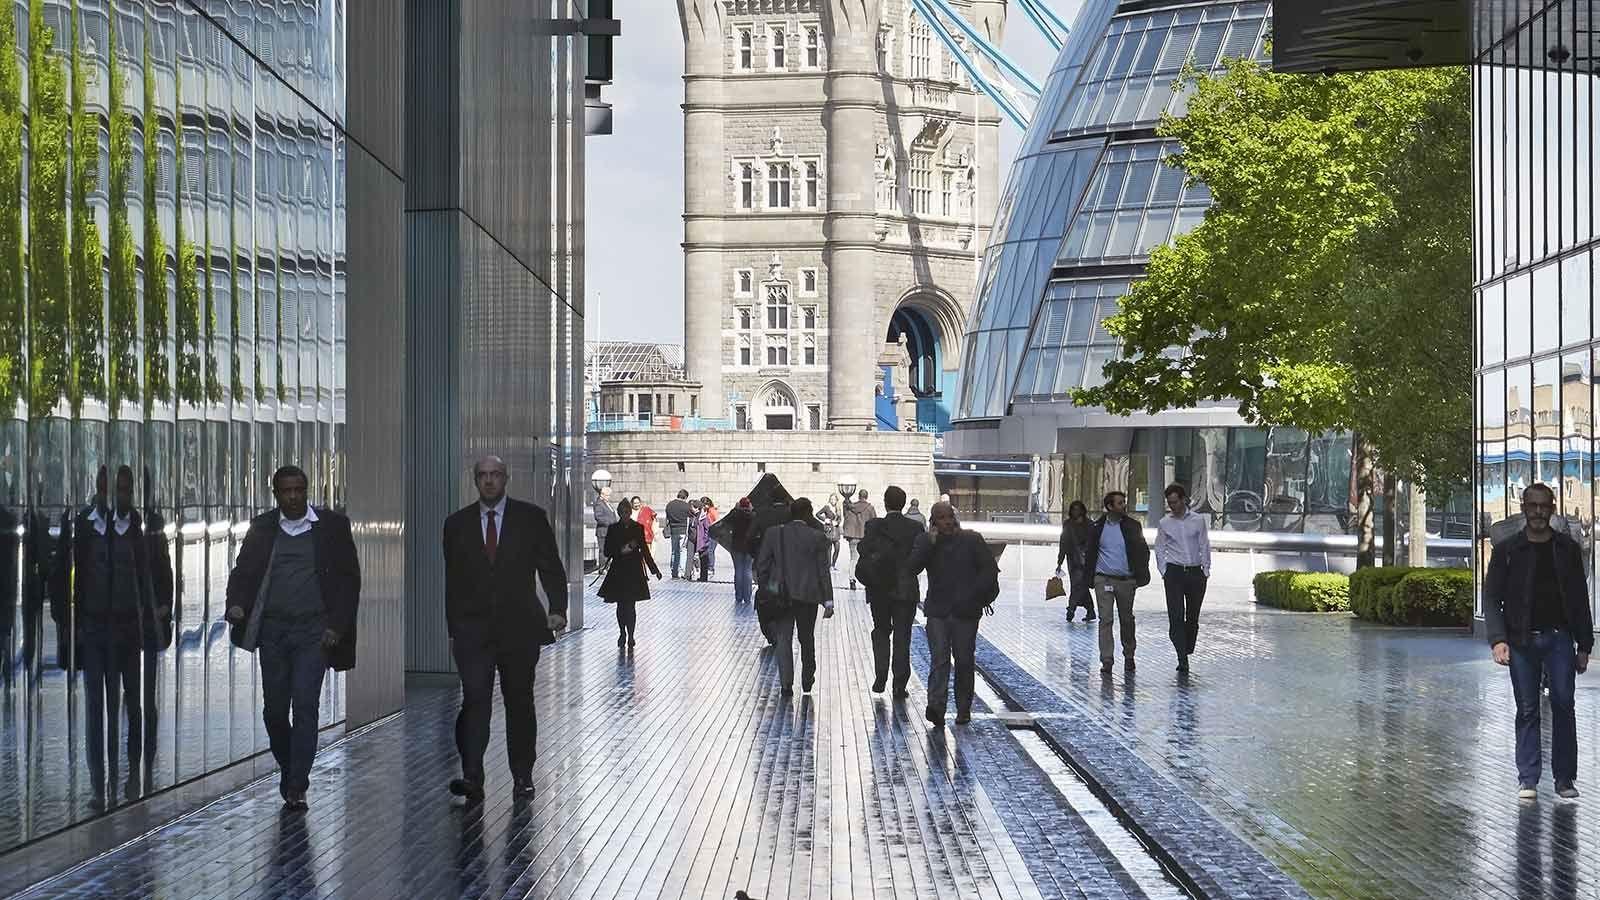 London People Walking to Tower Bridge - Mace Group